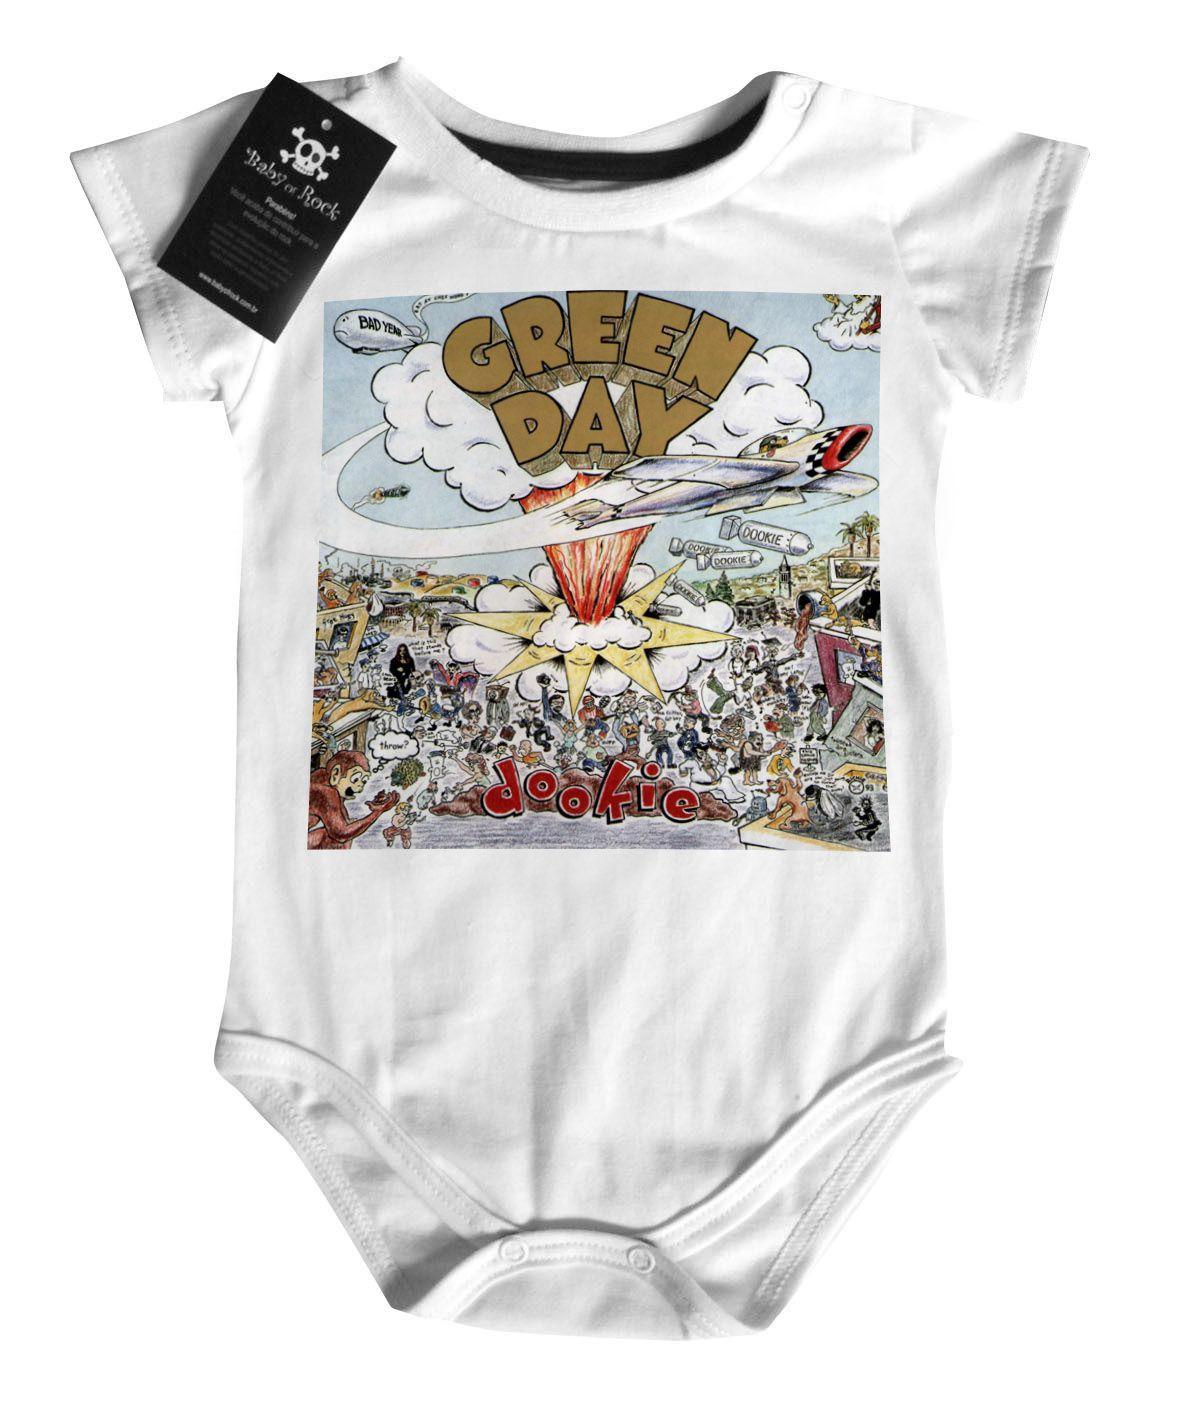 Body Bebe  Rock  Green Day - White  - Baby Monster - Body Bebe